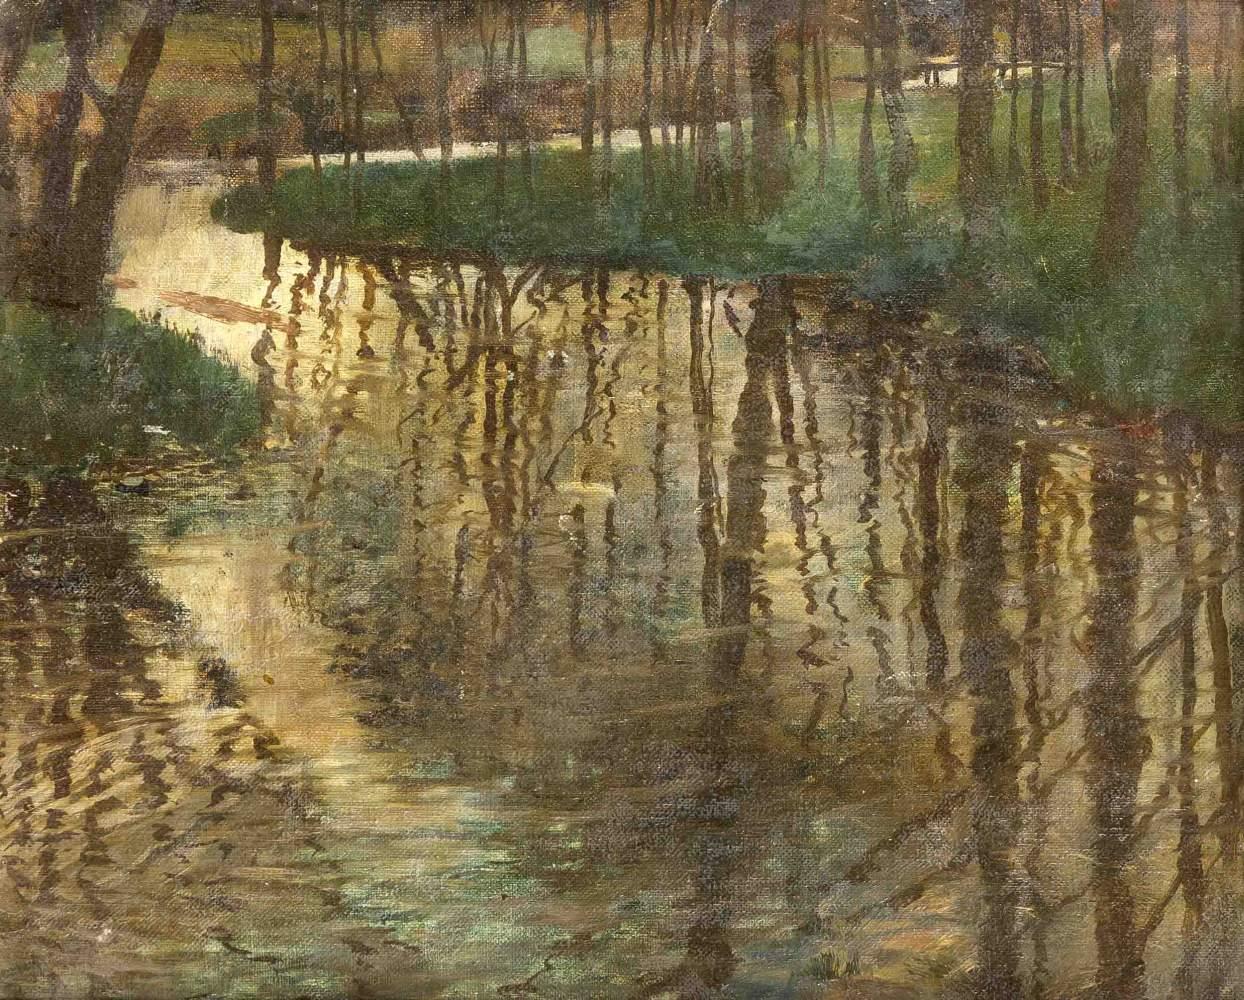 Lot 1285 - Heinrich Basedow (1865-1930), Berliner Maler, studierte an der Akademie in Berlin unterEugen